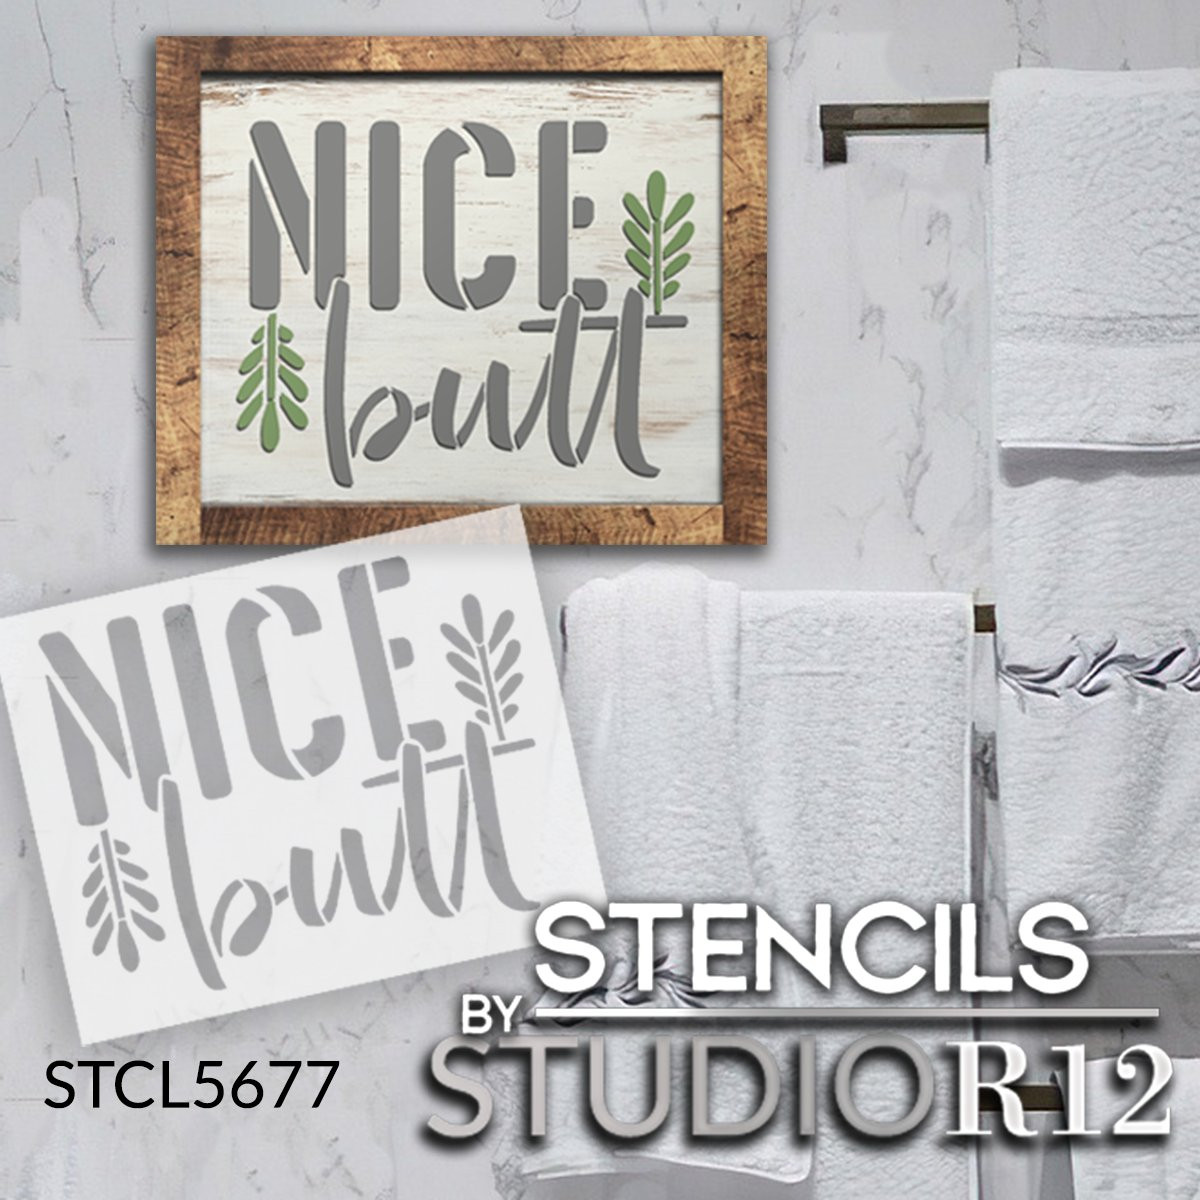 Nice Butt by StudioR12   Craft DIY Funny Farmhouse Bathroom Home Decor   Paint Laurel Branch Wood Sign   Reusable Mylar Template   Select Size